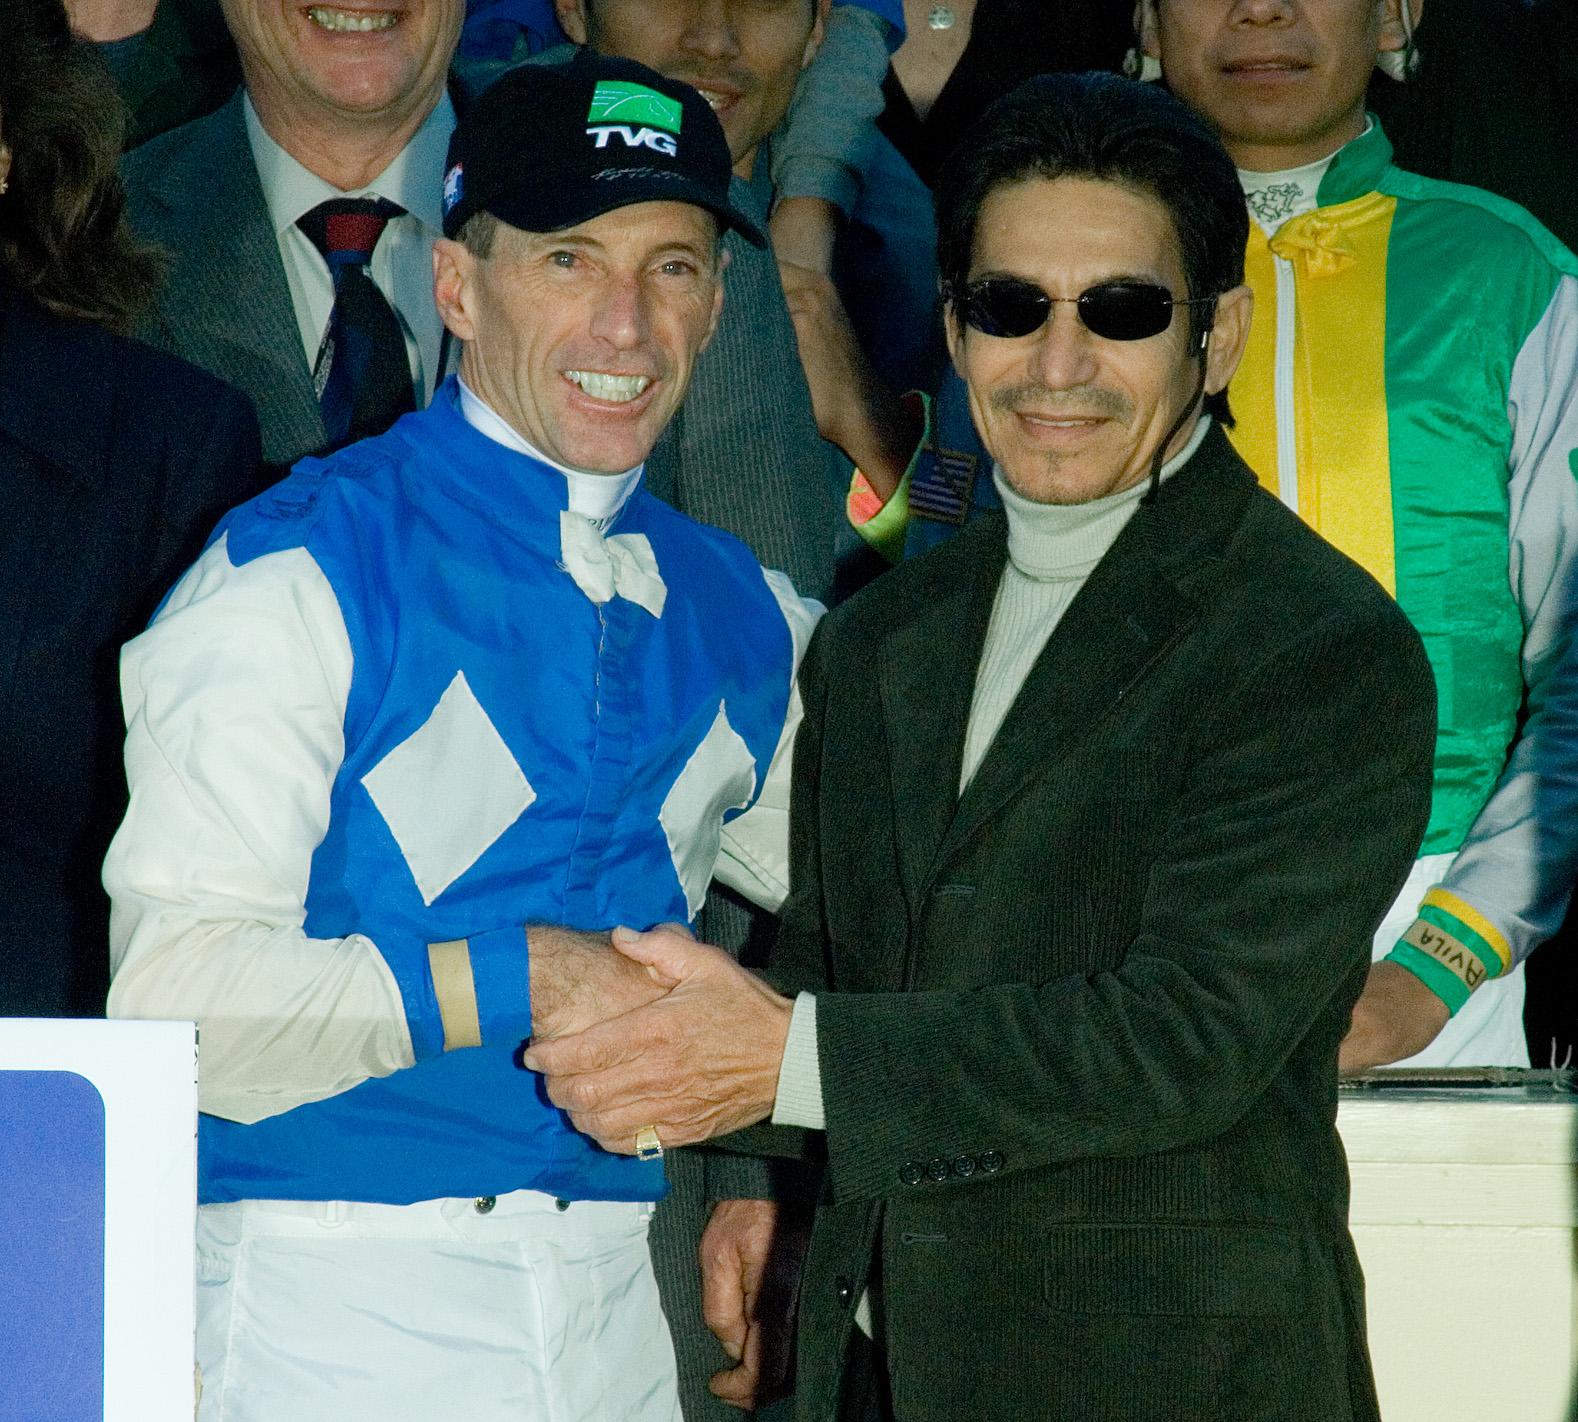 Russell Baze, left, and Laffit Pincay, Jr. (Benoit Photo)